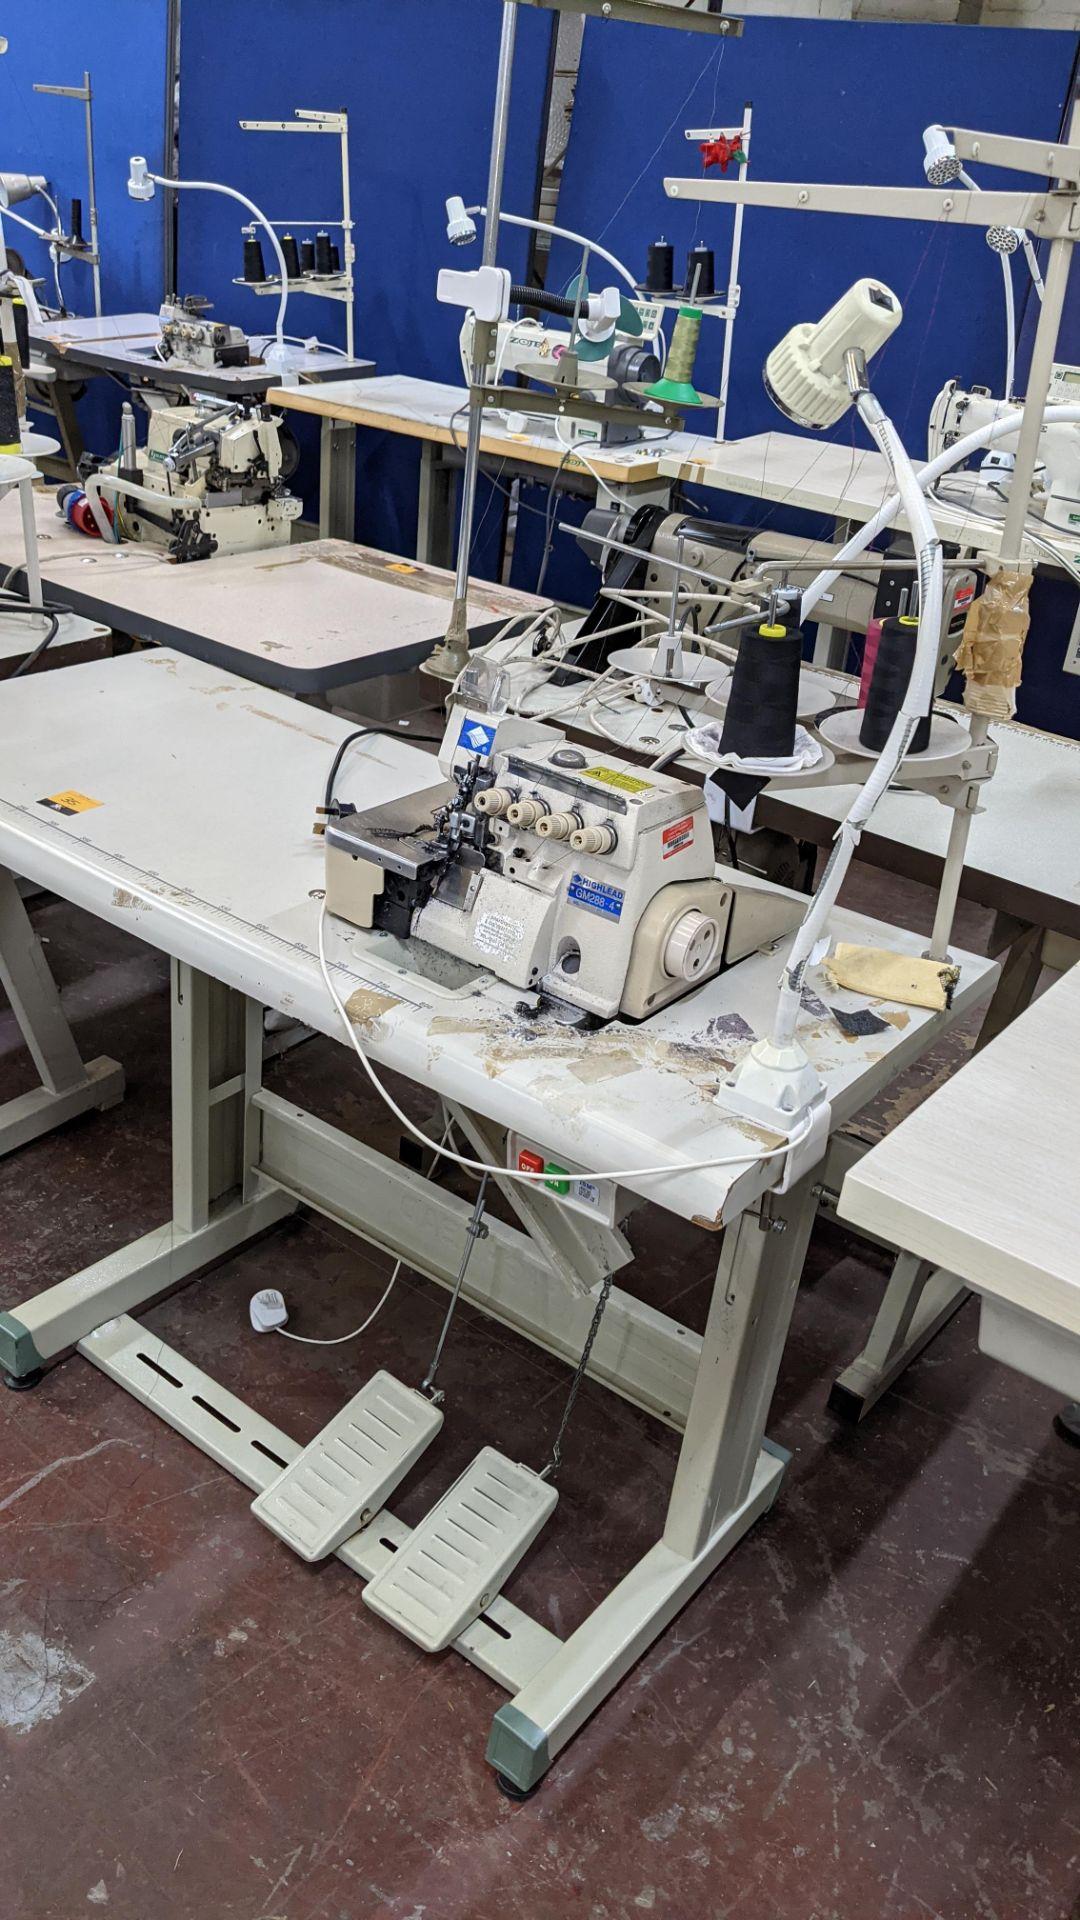 Highlead overlocker model GM288-4 - Image 3 of 16